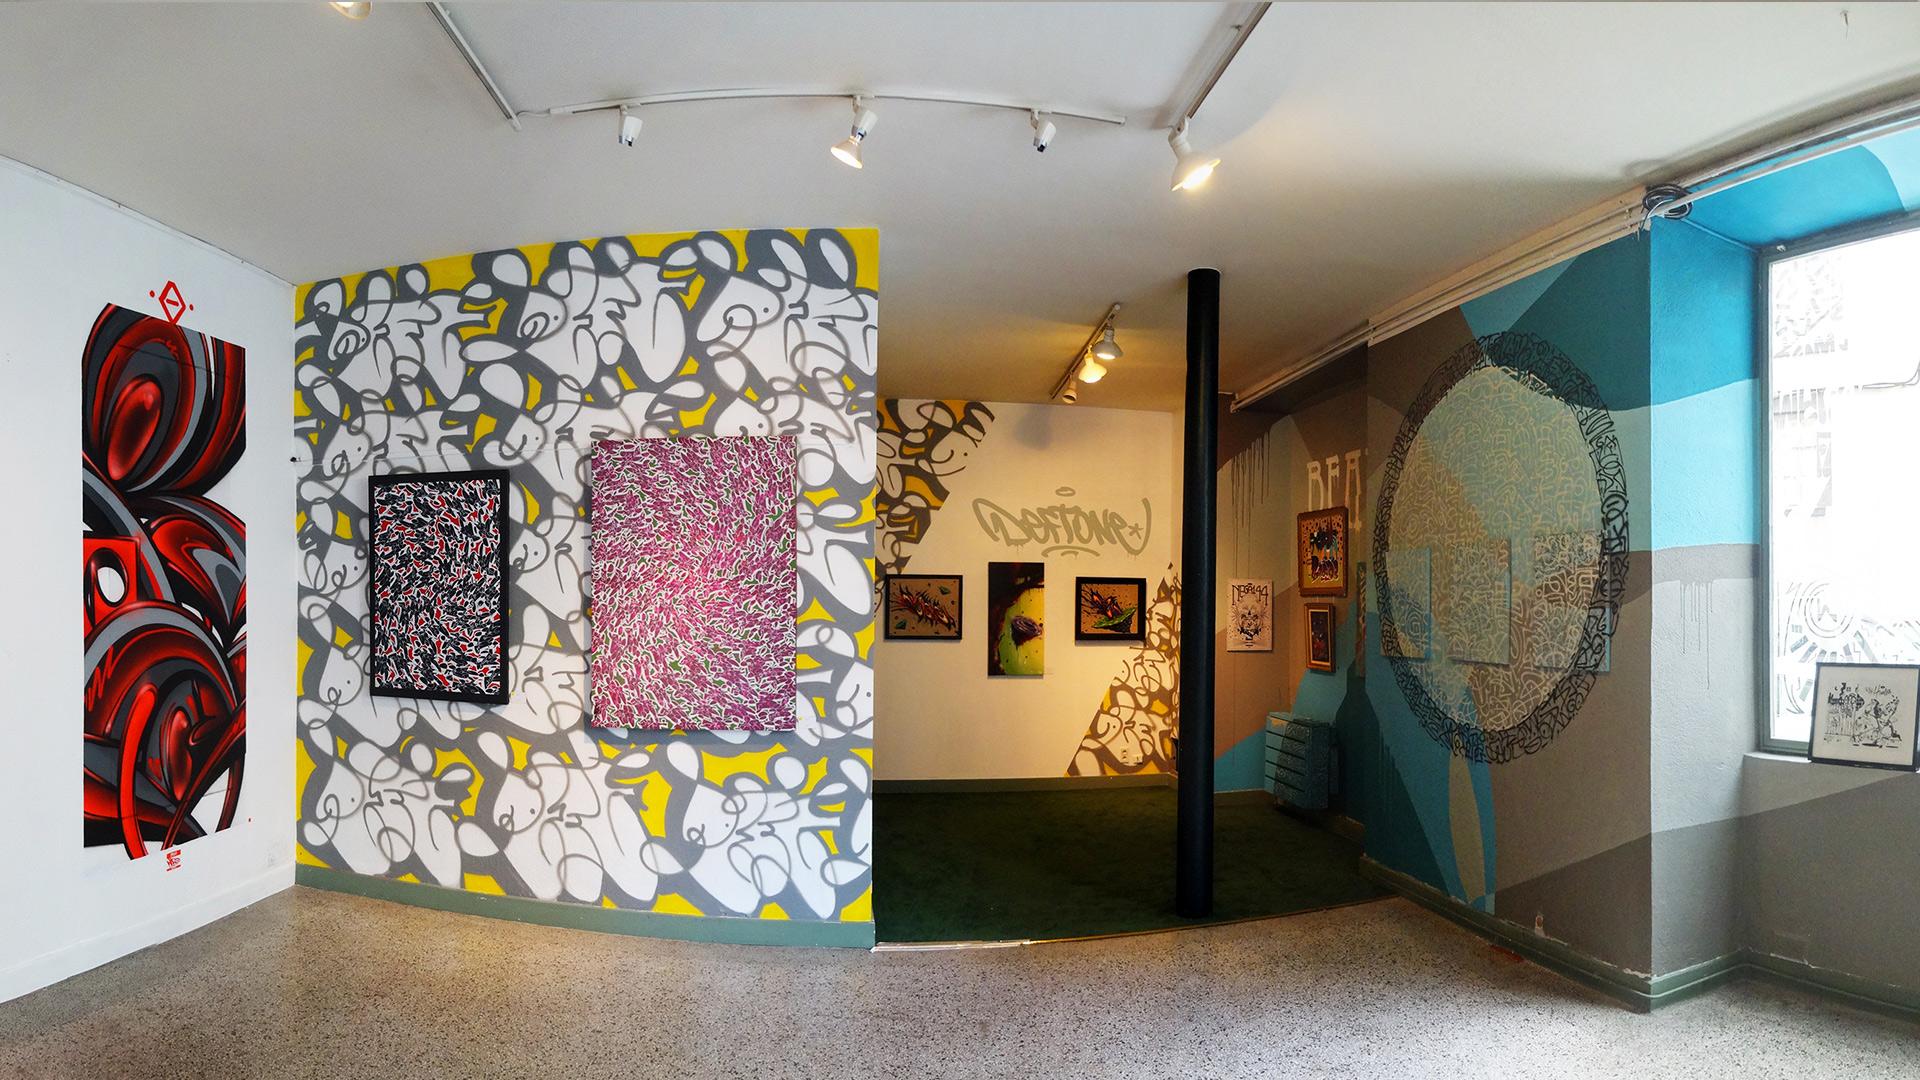 Deft -Exposition ENDtoEND - Street-Art - Rue Savaron Clermont-Ferrand